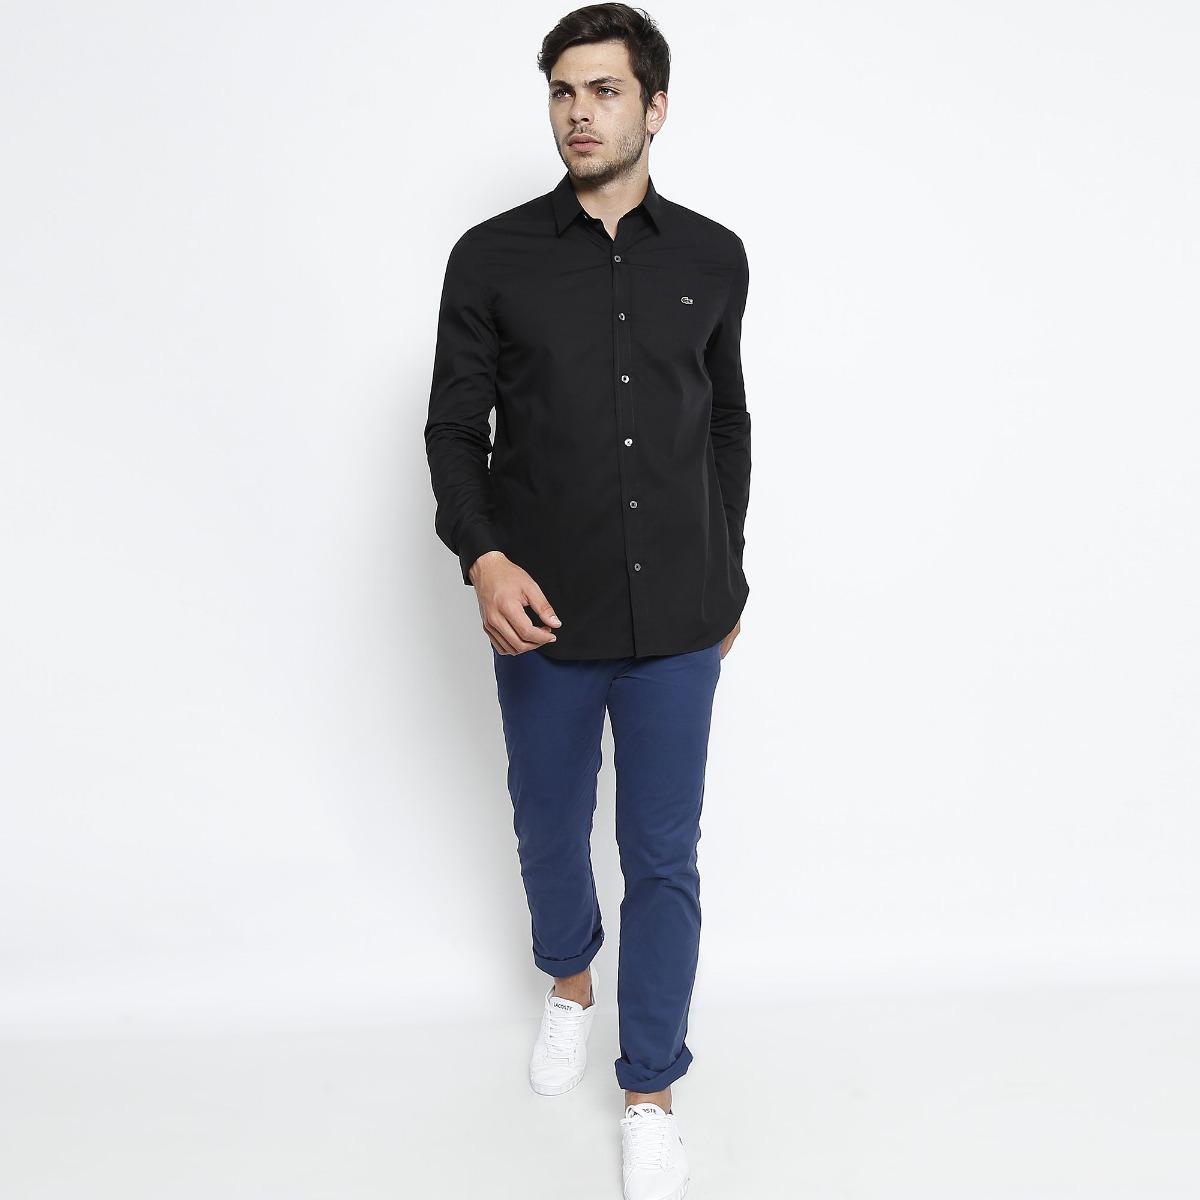 c3918eb7b479f camisa social lacoste masculina regular fit bordado -. Carregando zoom.